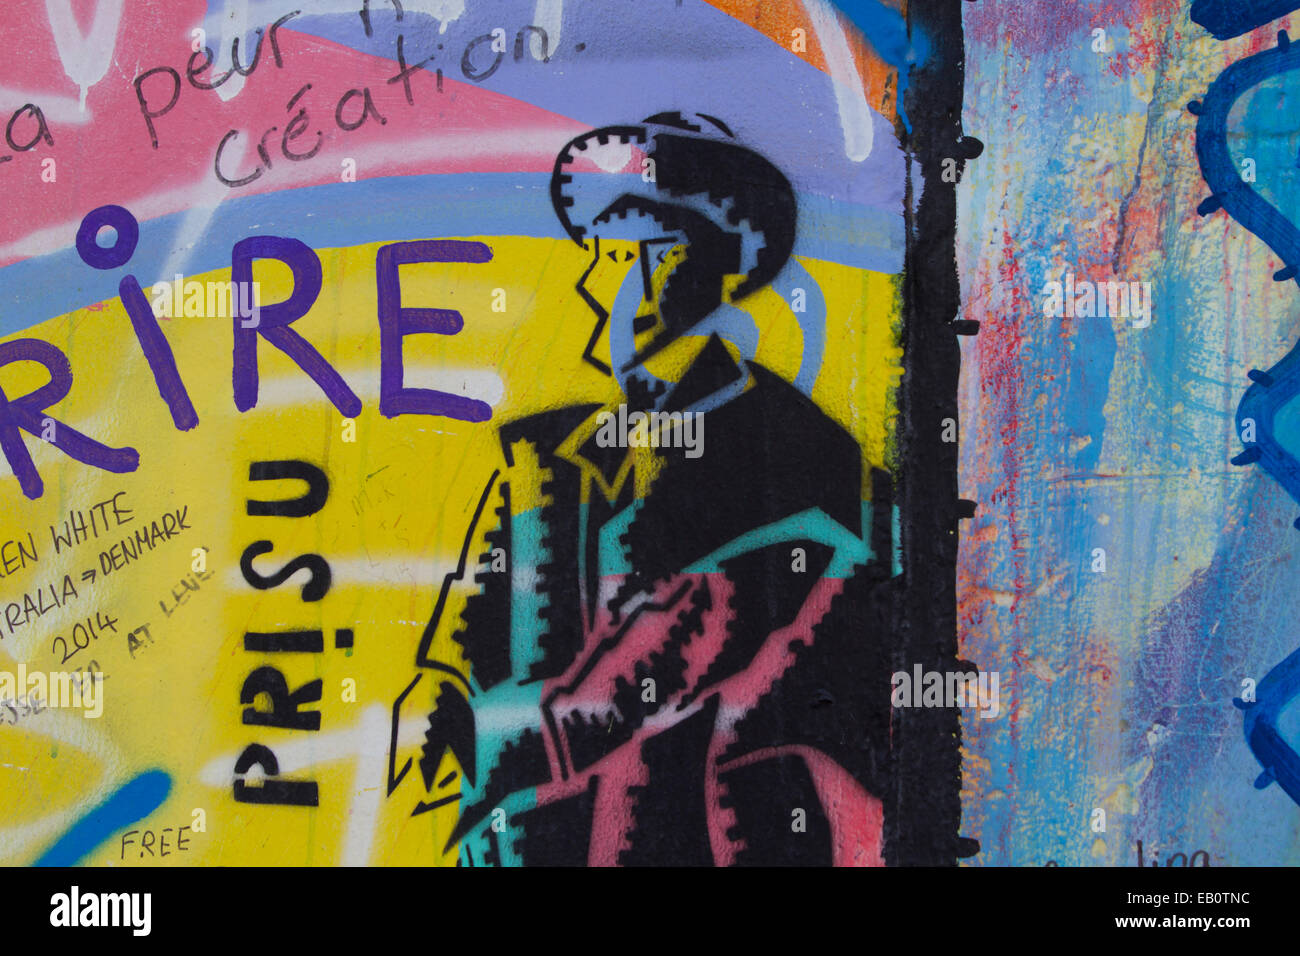 Berlin Wall Cartoon man agent Graffiti street art Stock Photo ...